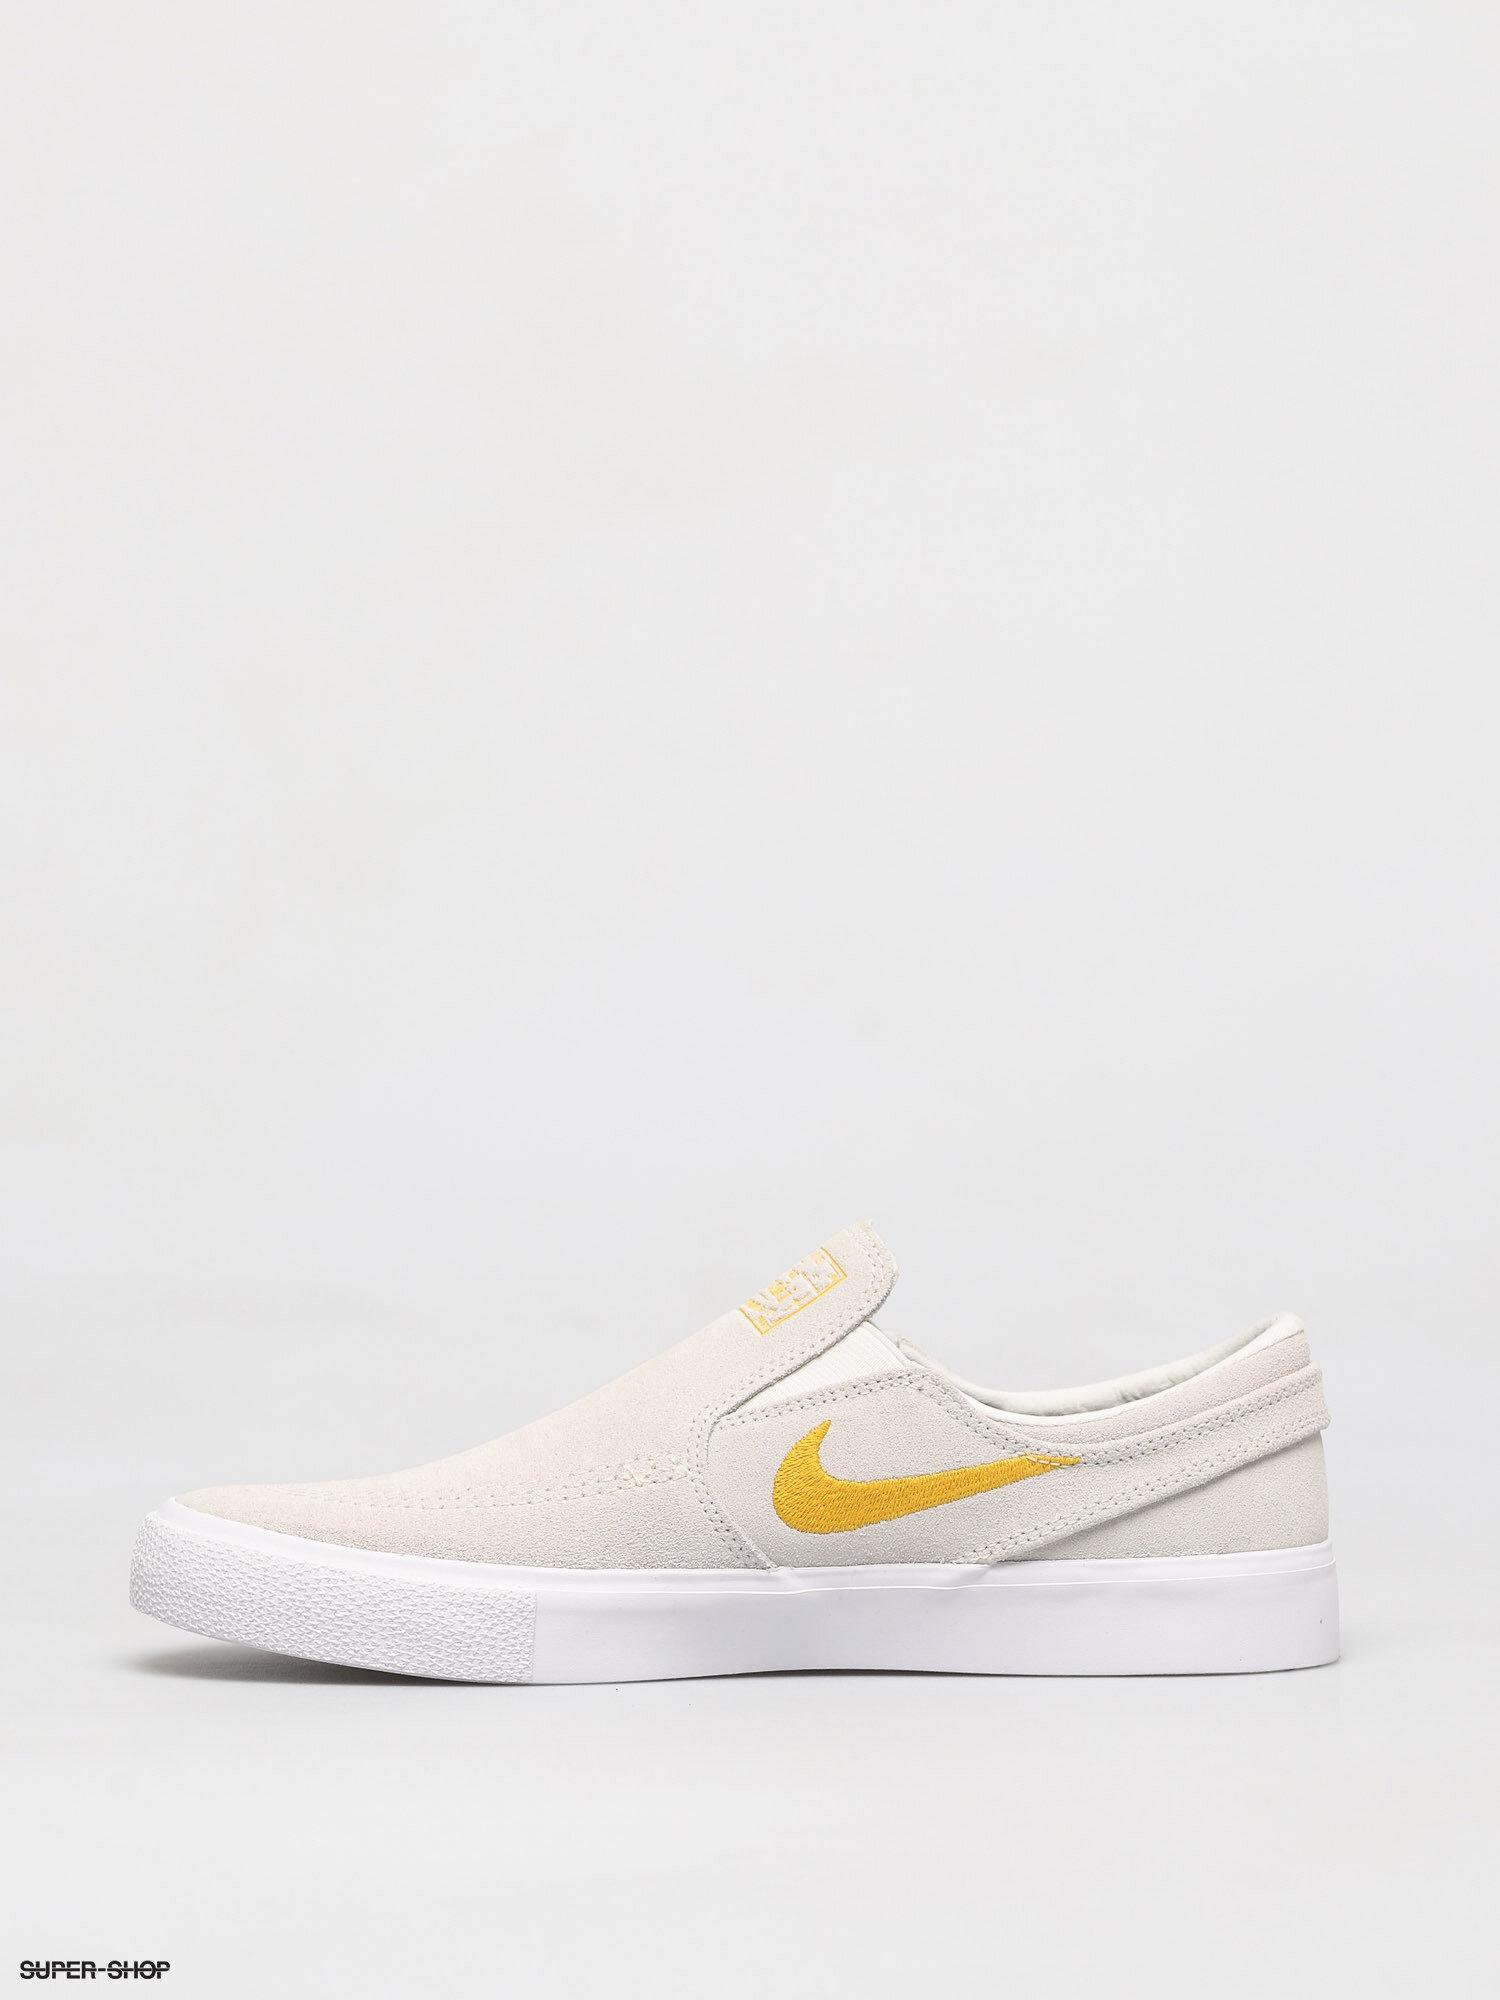 Nike SB Janoski Slip On (Summit/Gold